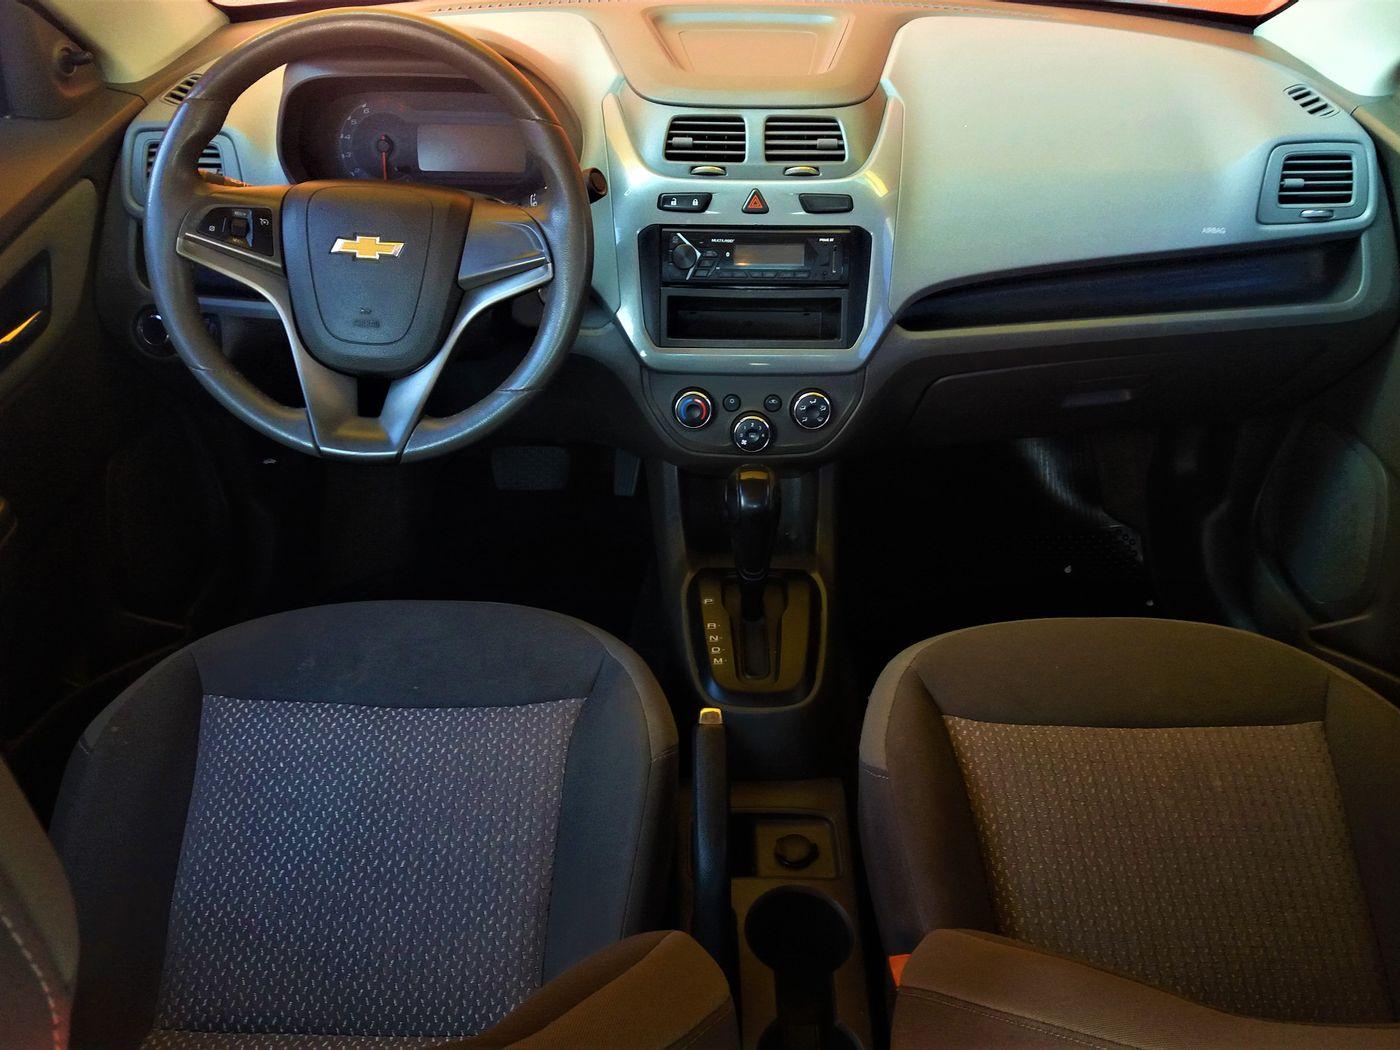 Chevrolet COBALT LT 1.8 8V Econo.Flex 4p Aut.